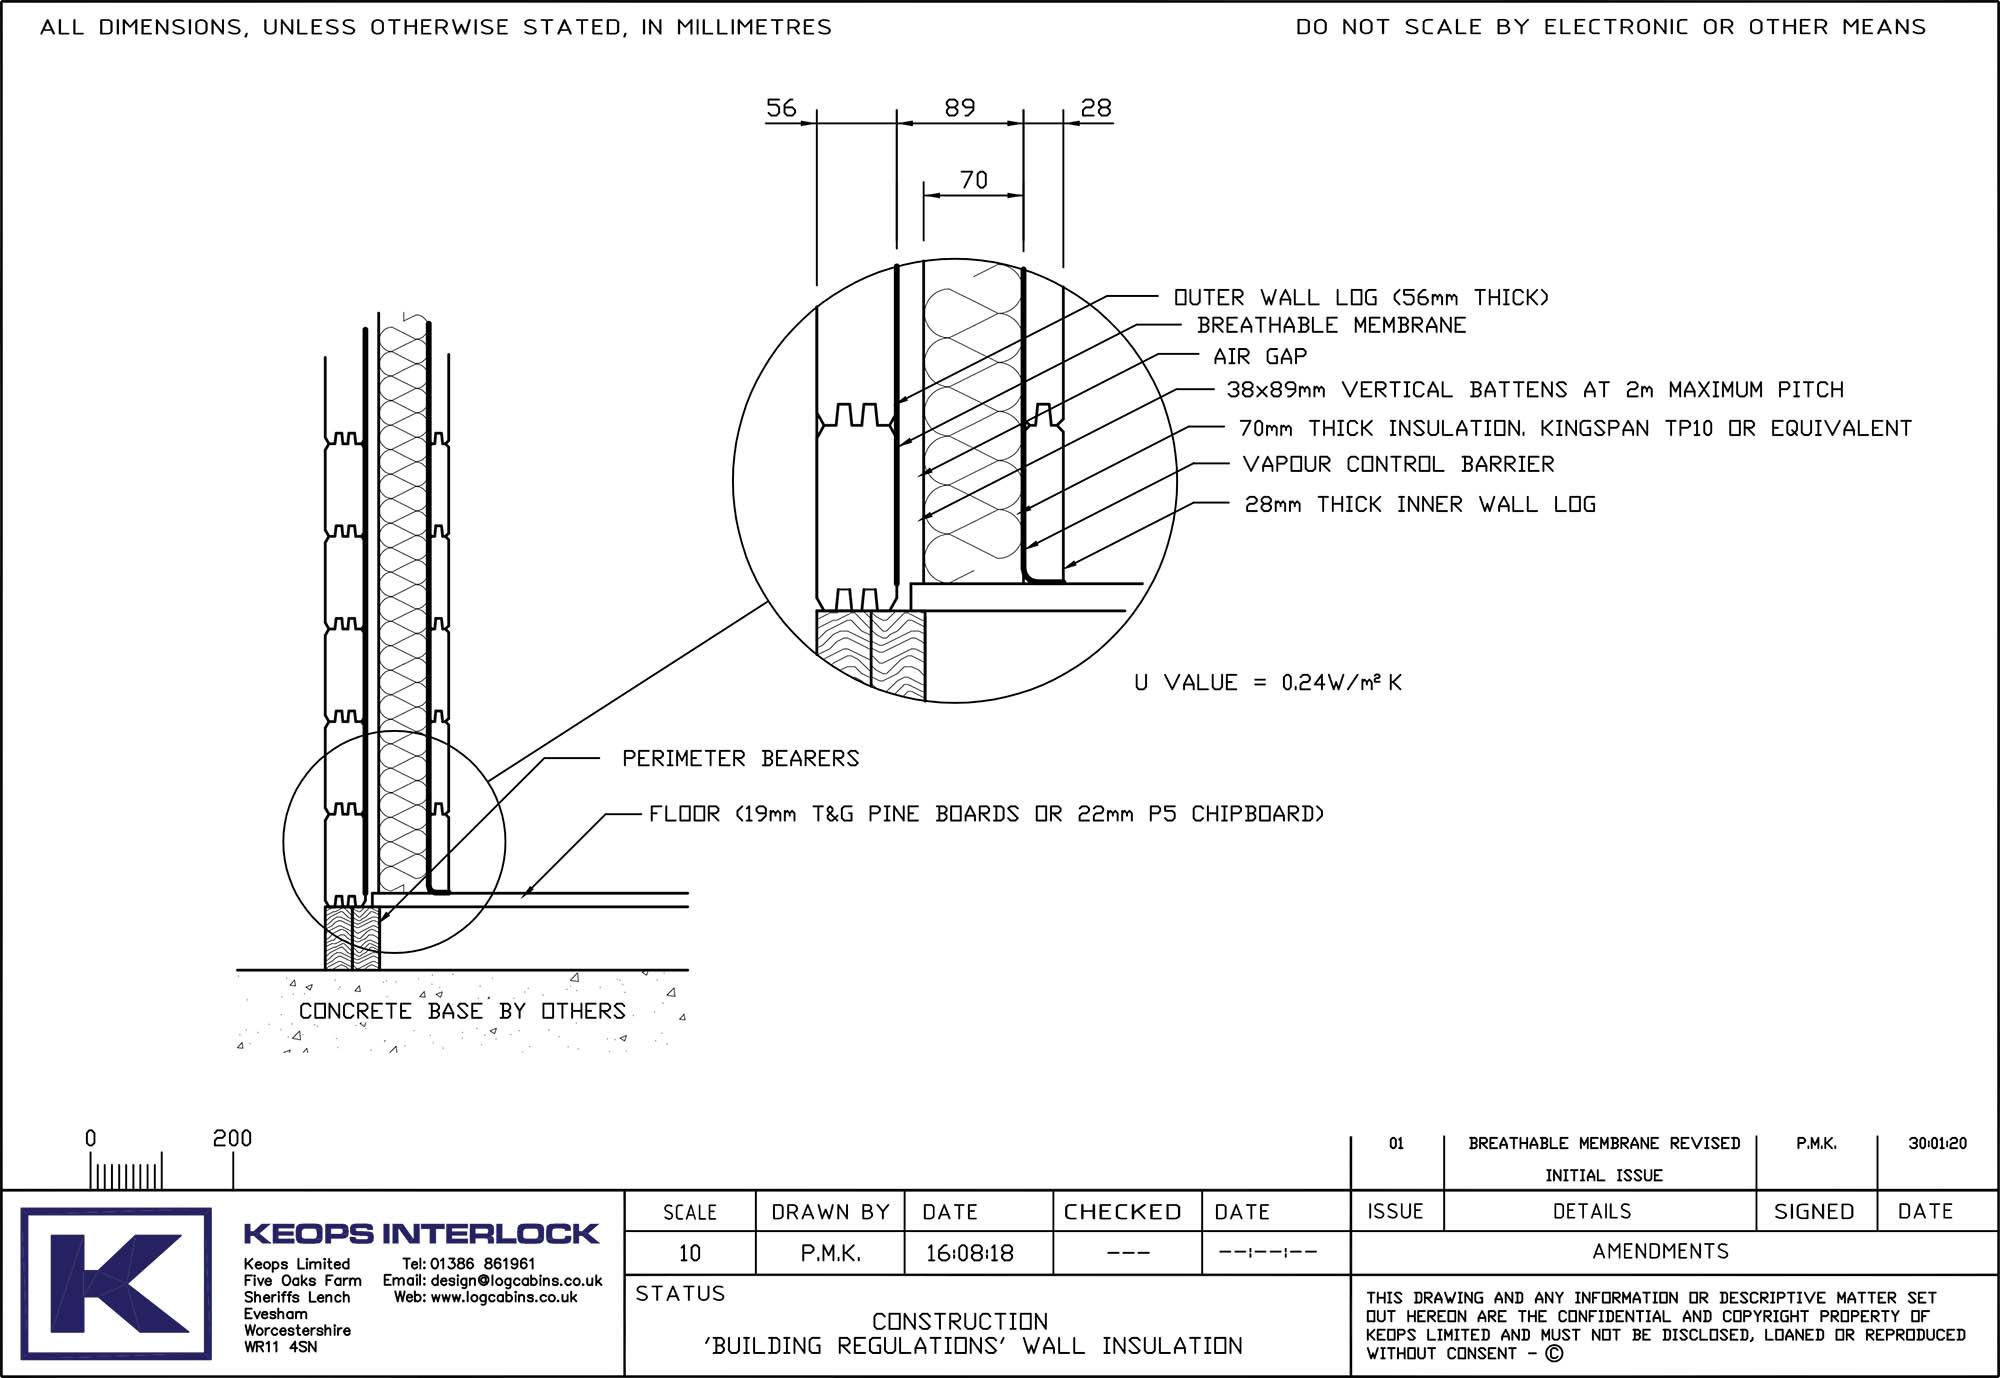 Keops Interlock Building Regulations wall insulation for log cabins